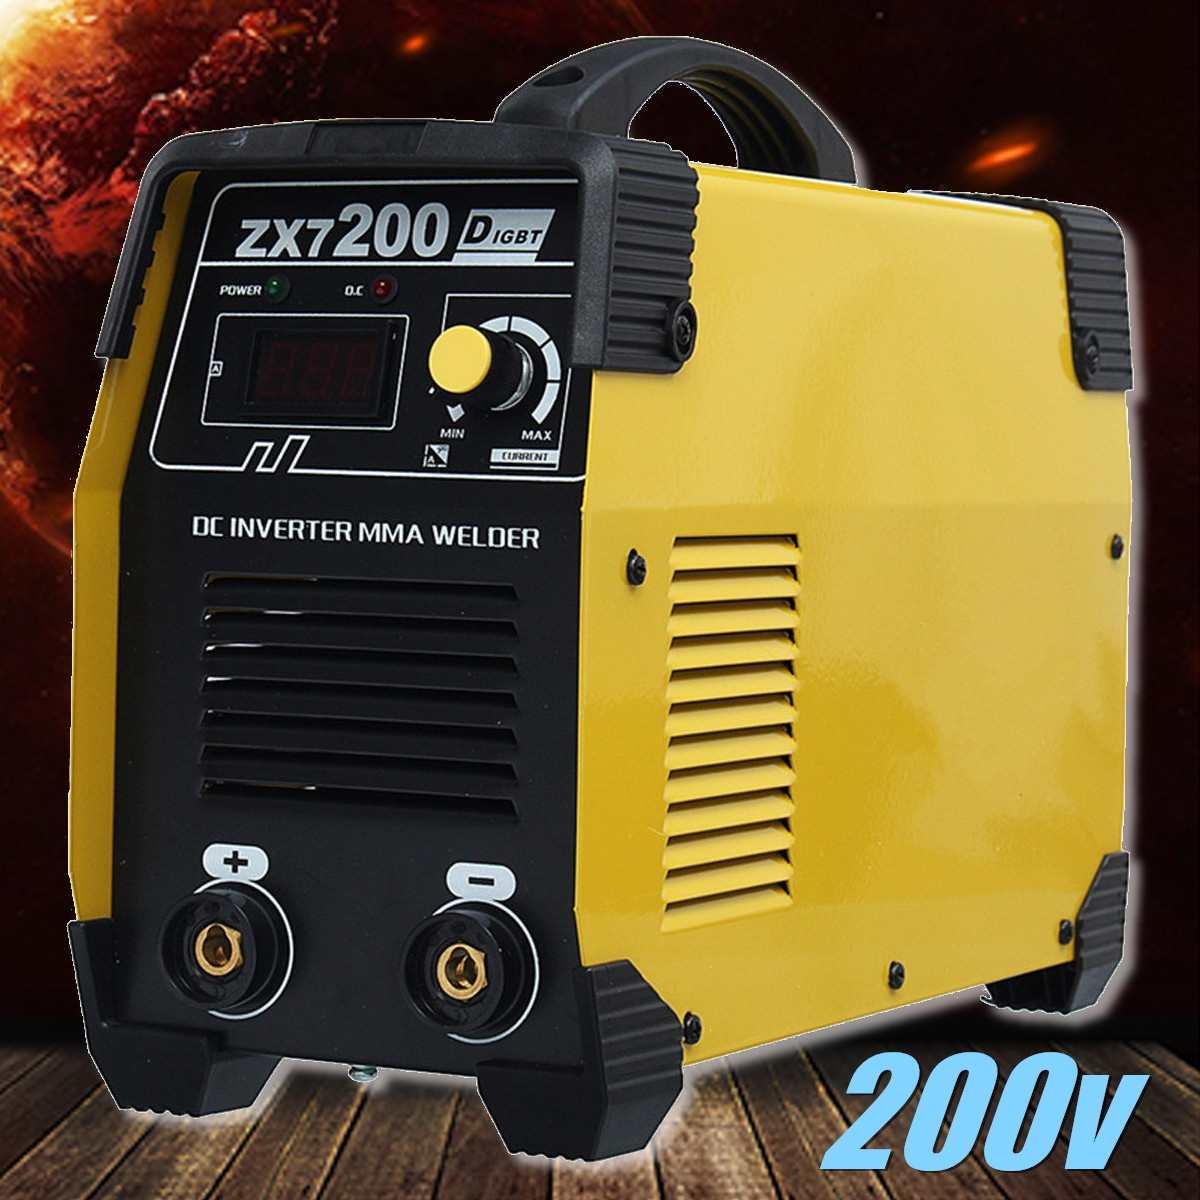 ZX7 200 220V Mini Portable Inverter DC Welders IGBT Welding Machine 20 200A Manual Home Arc Welders Welding Equipment Tools